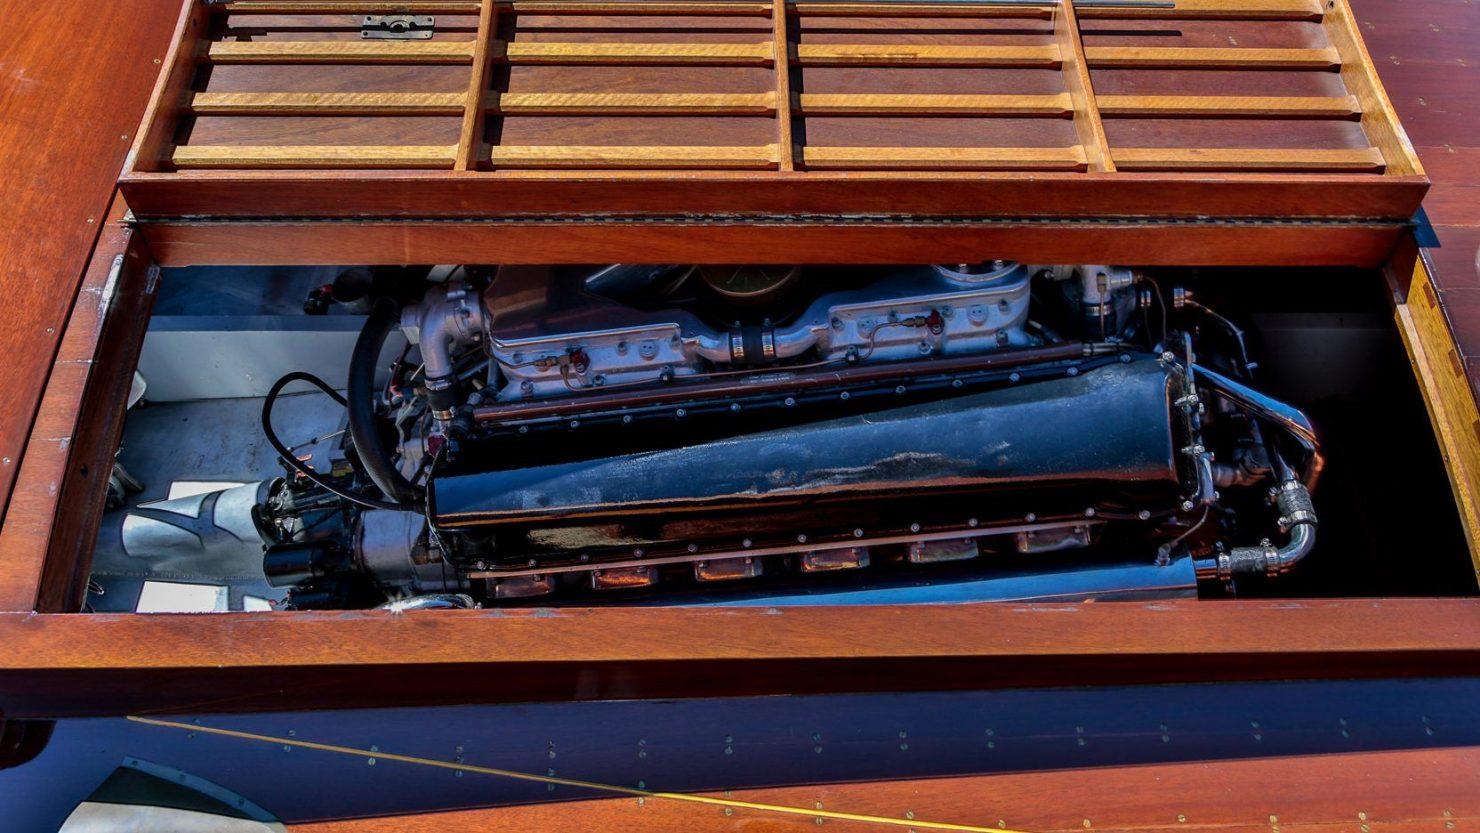 mahogany speed boat 10 1480x833 - 27 Liter V12 Brown & Bassett Gentleman's Racer